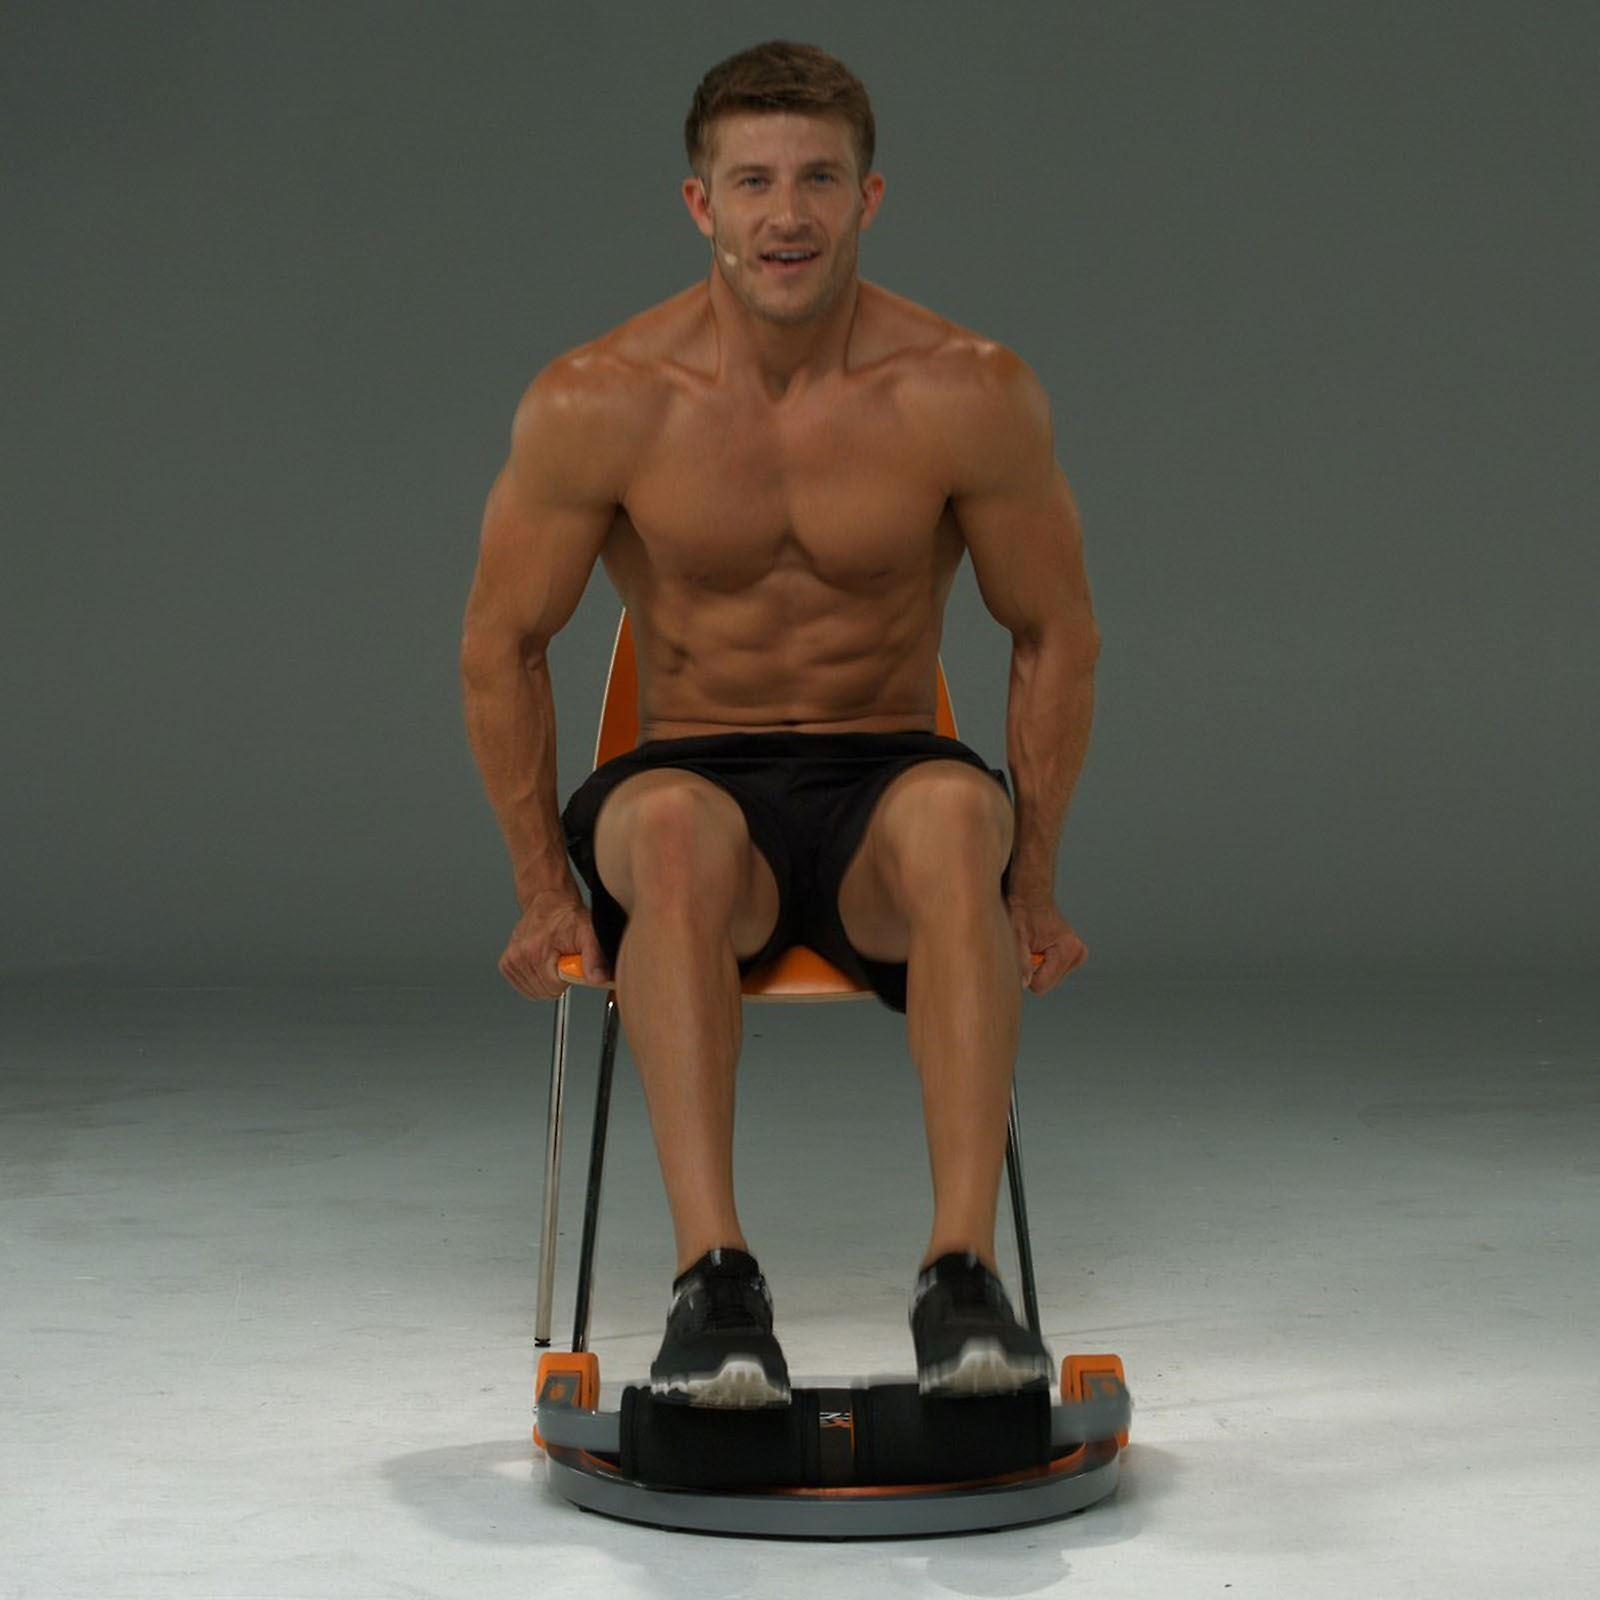 JML Flex Core 8 Ab Workout and Exercise Machine